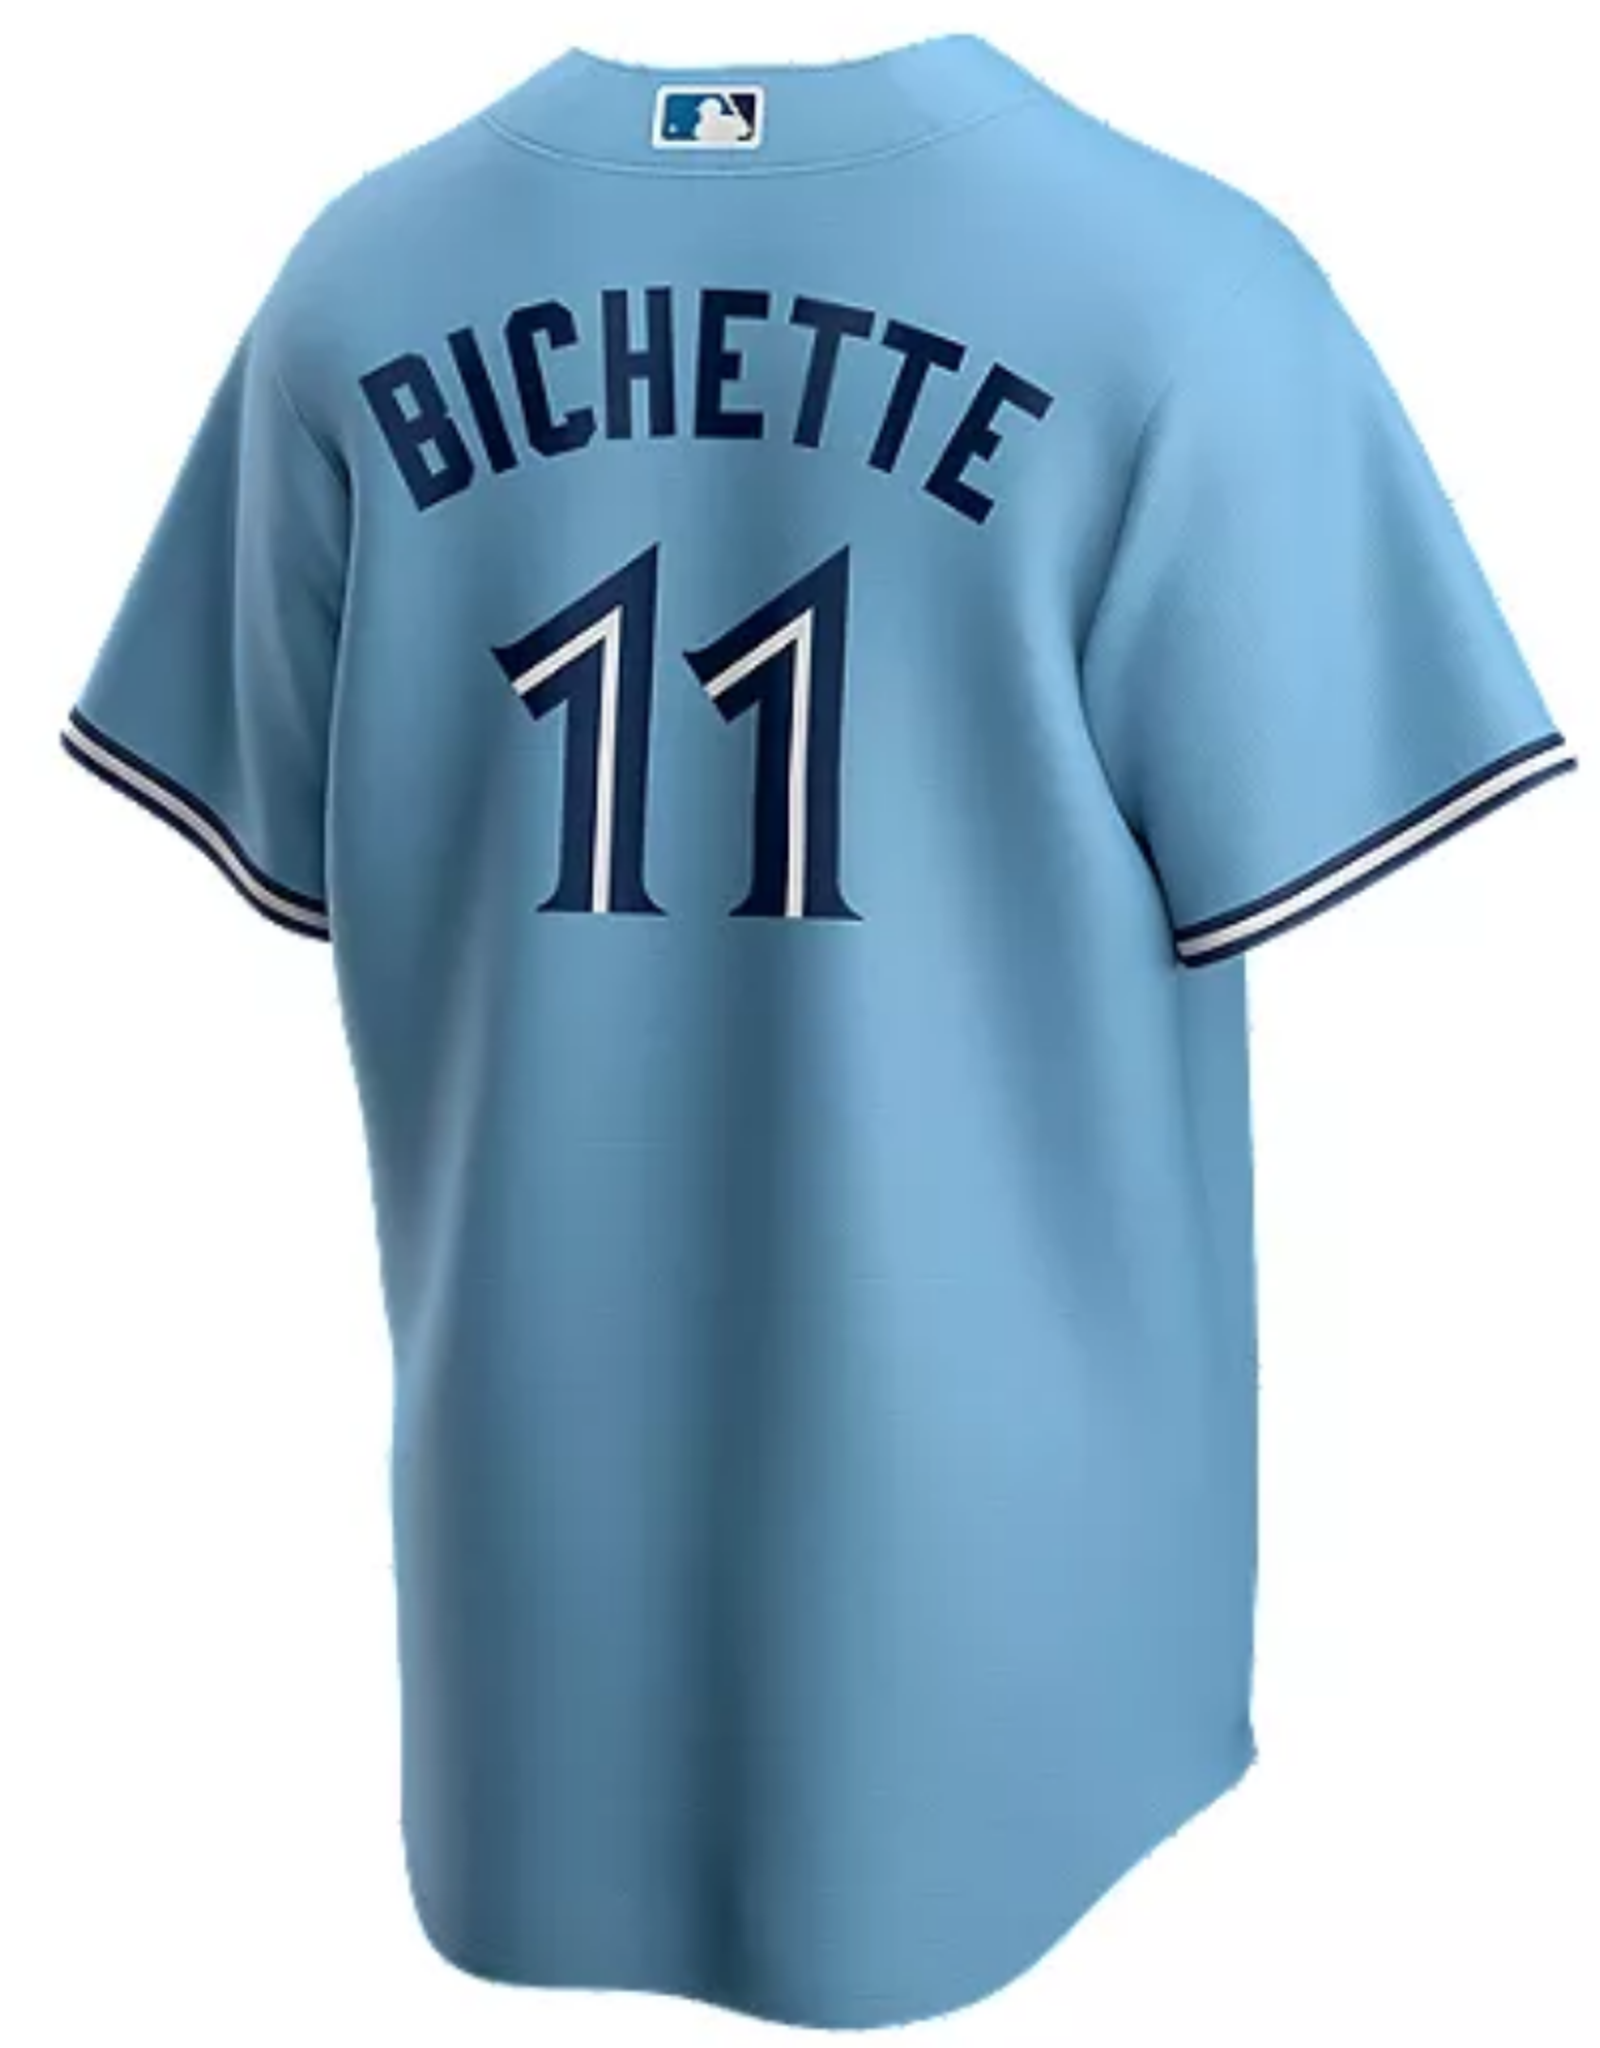 Nike Men's Replica Jersey Bichette #11 Toronto Blue Jays Horizon Blue